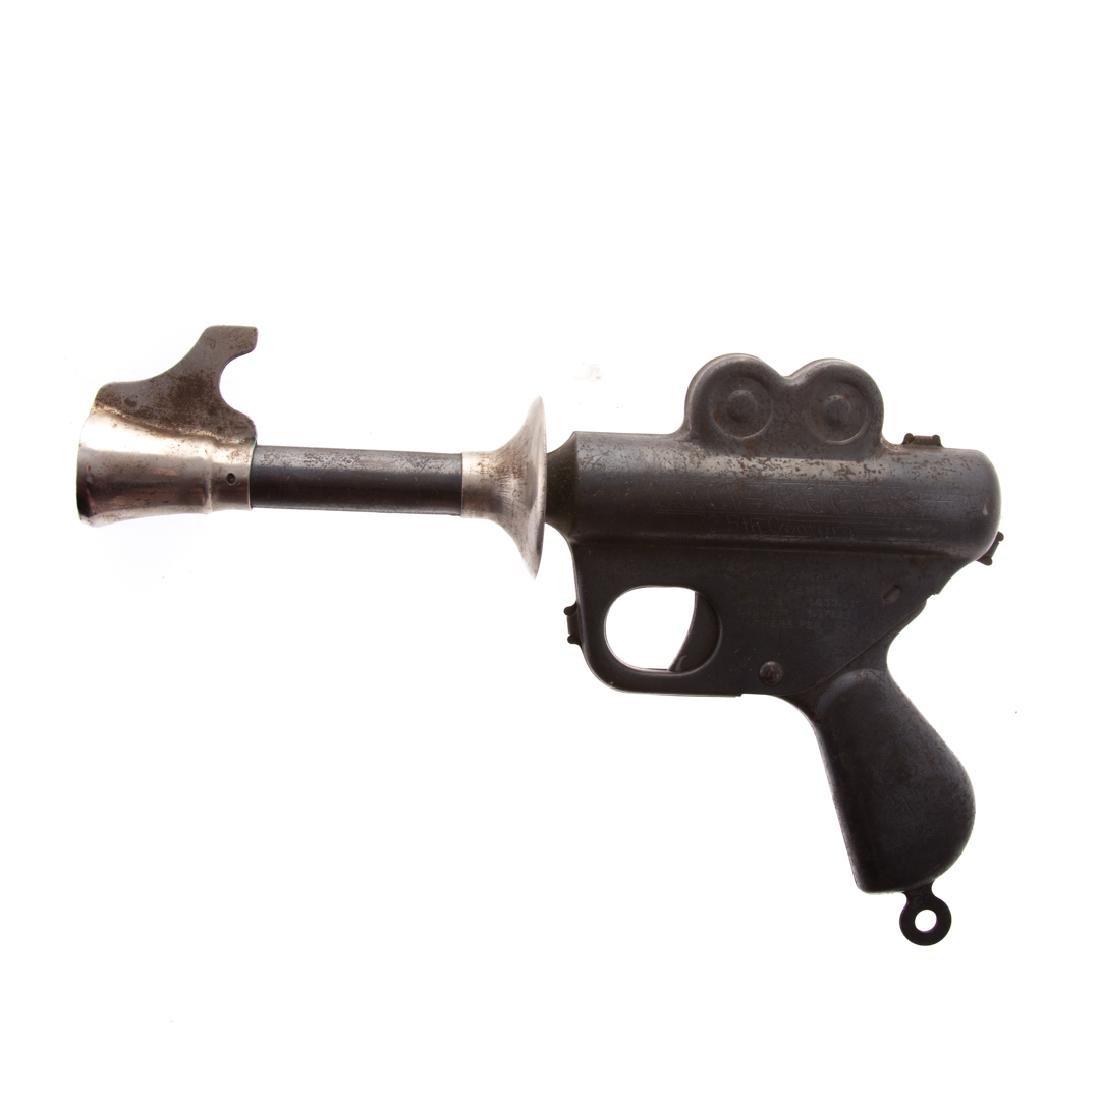 Buck Rogers 25th Century Rocket Pistol with Box - 2